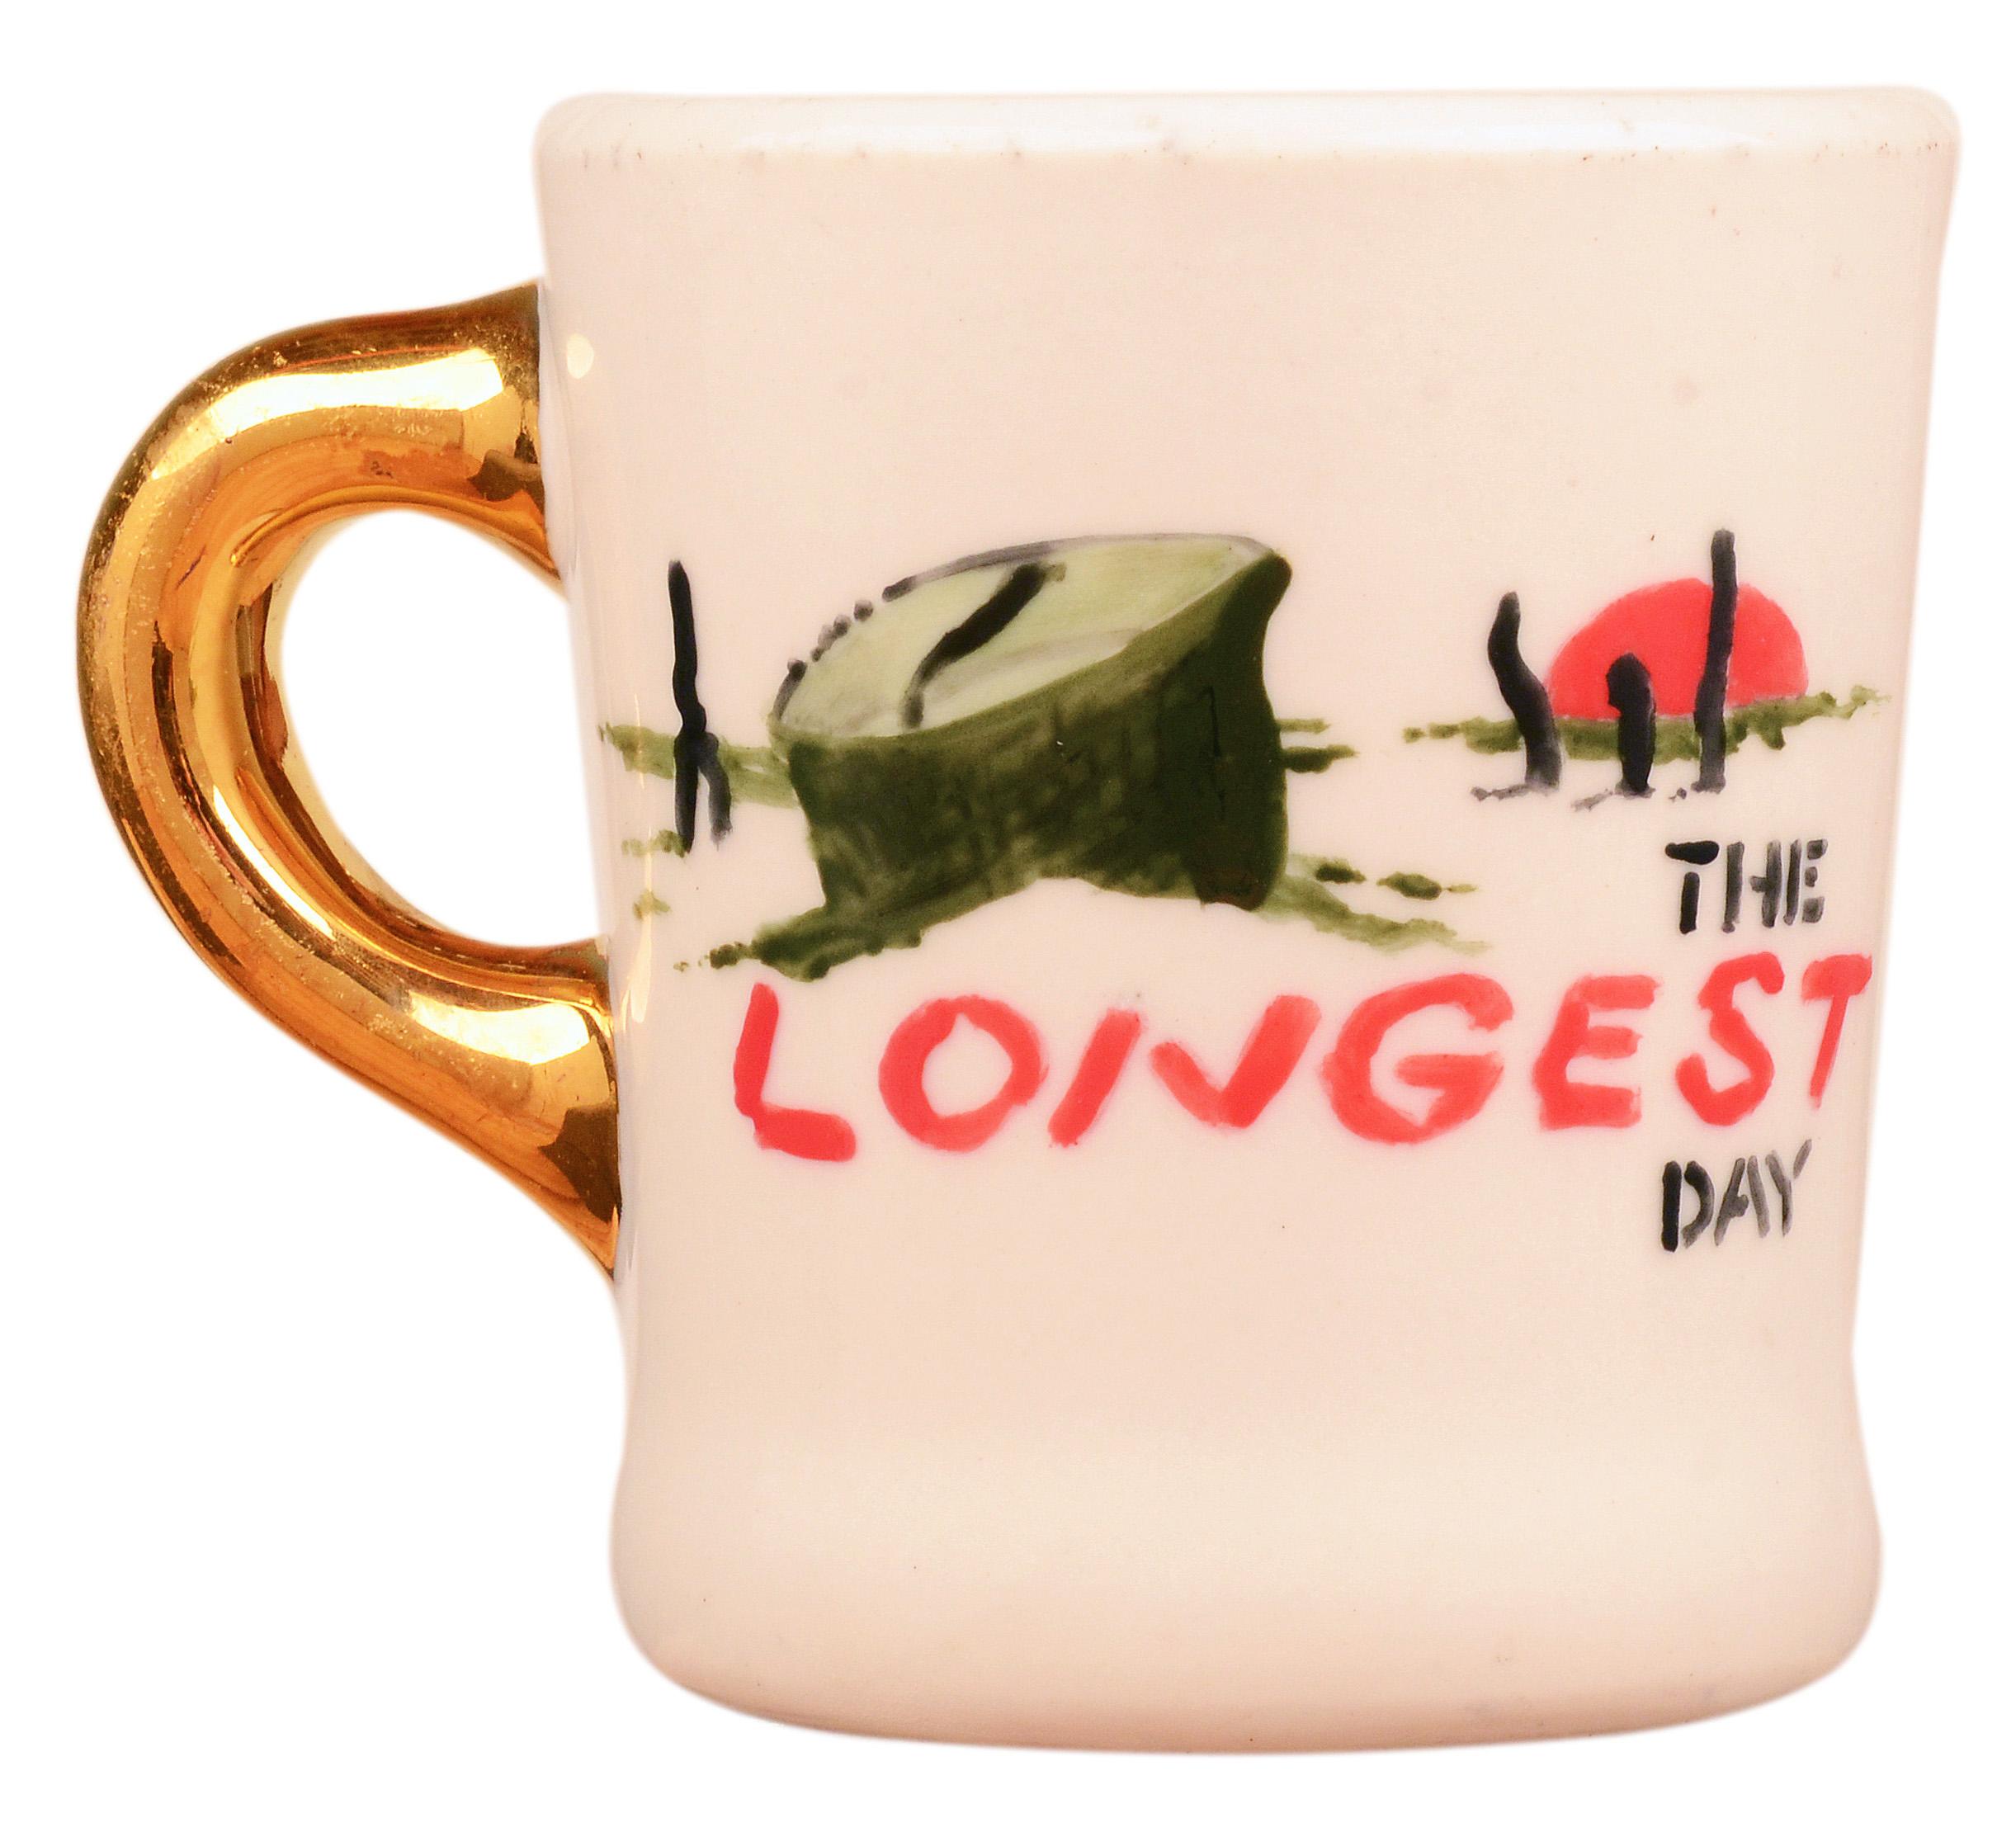 John Wayne mug for the 1962 movie The Longest Day, front.